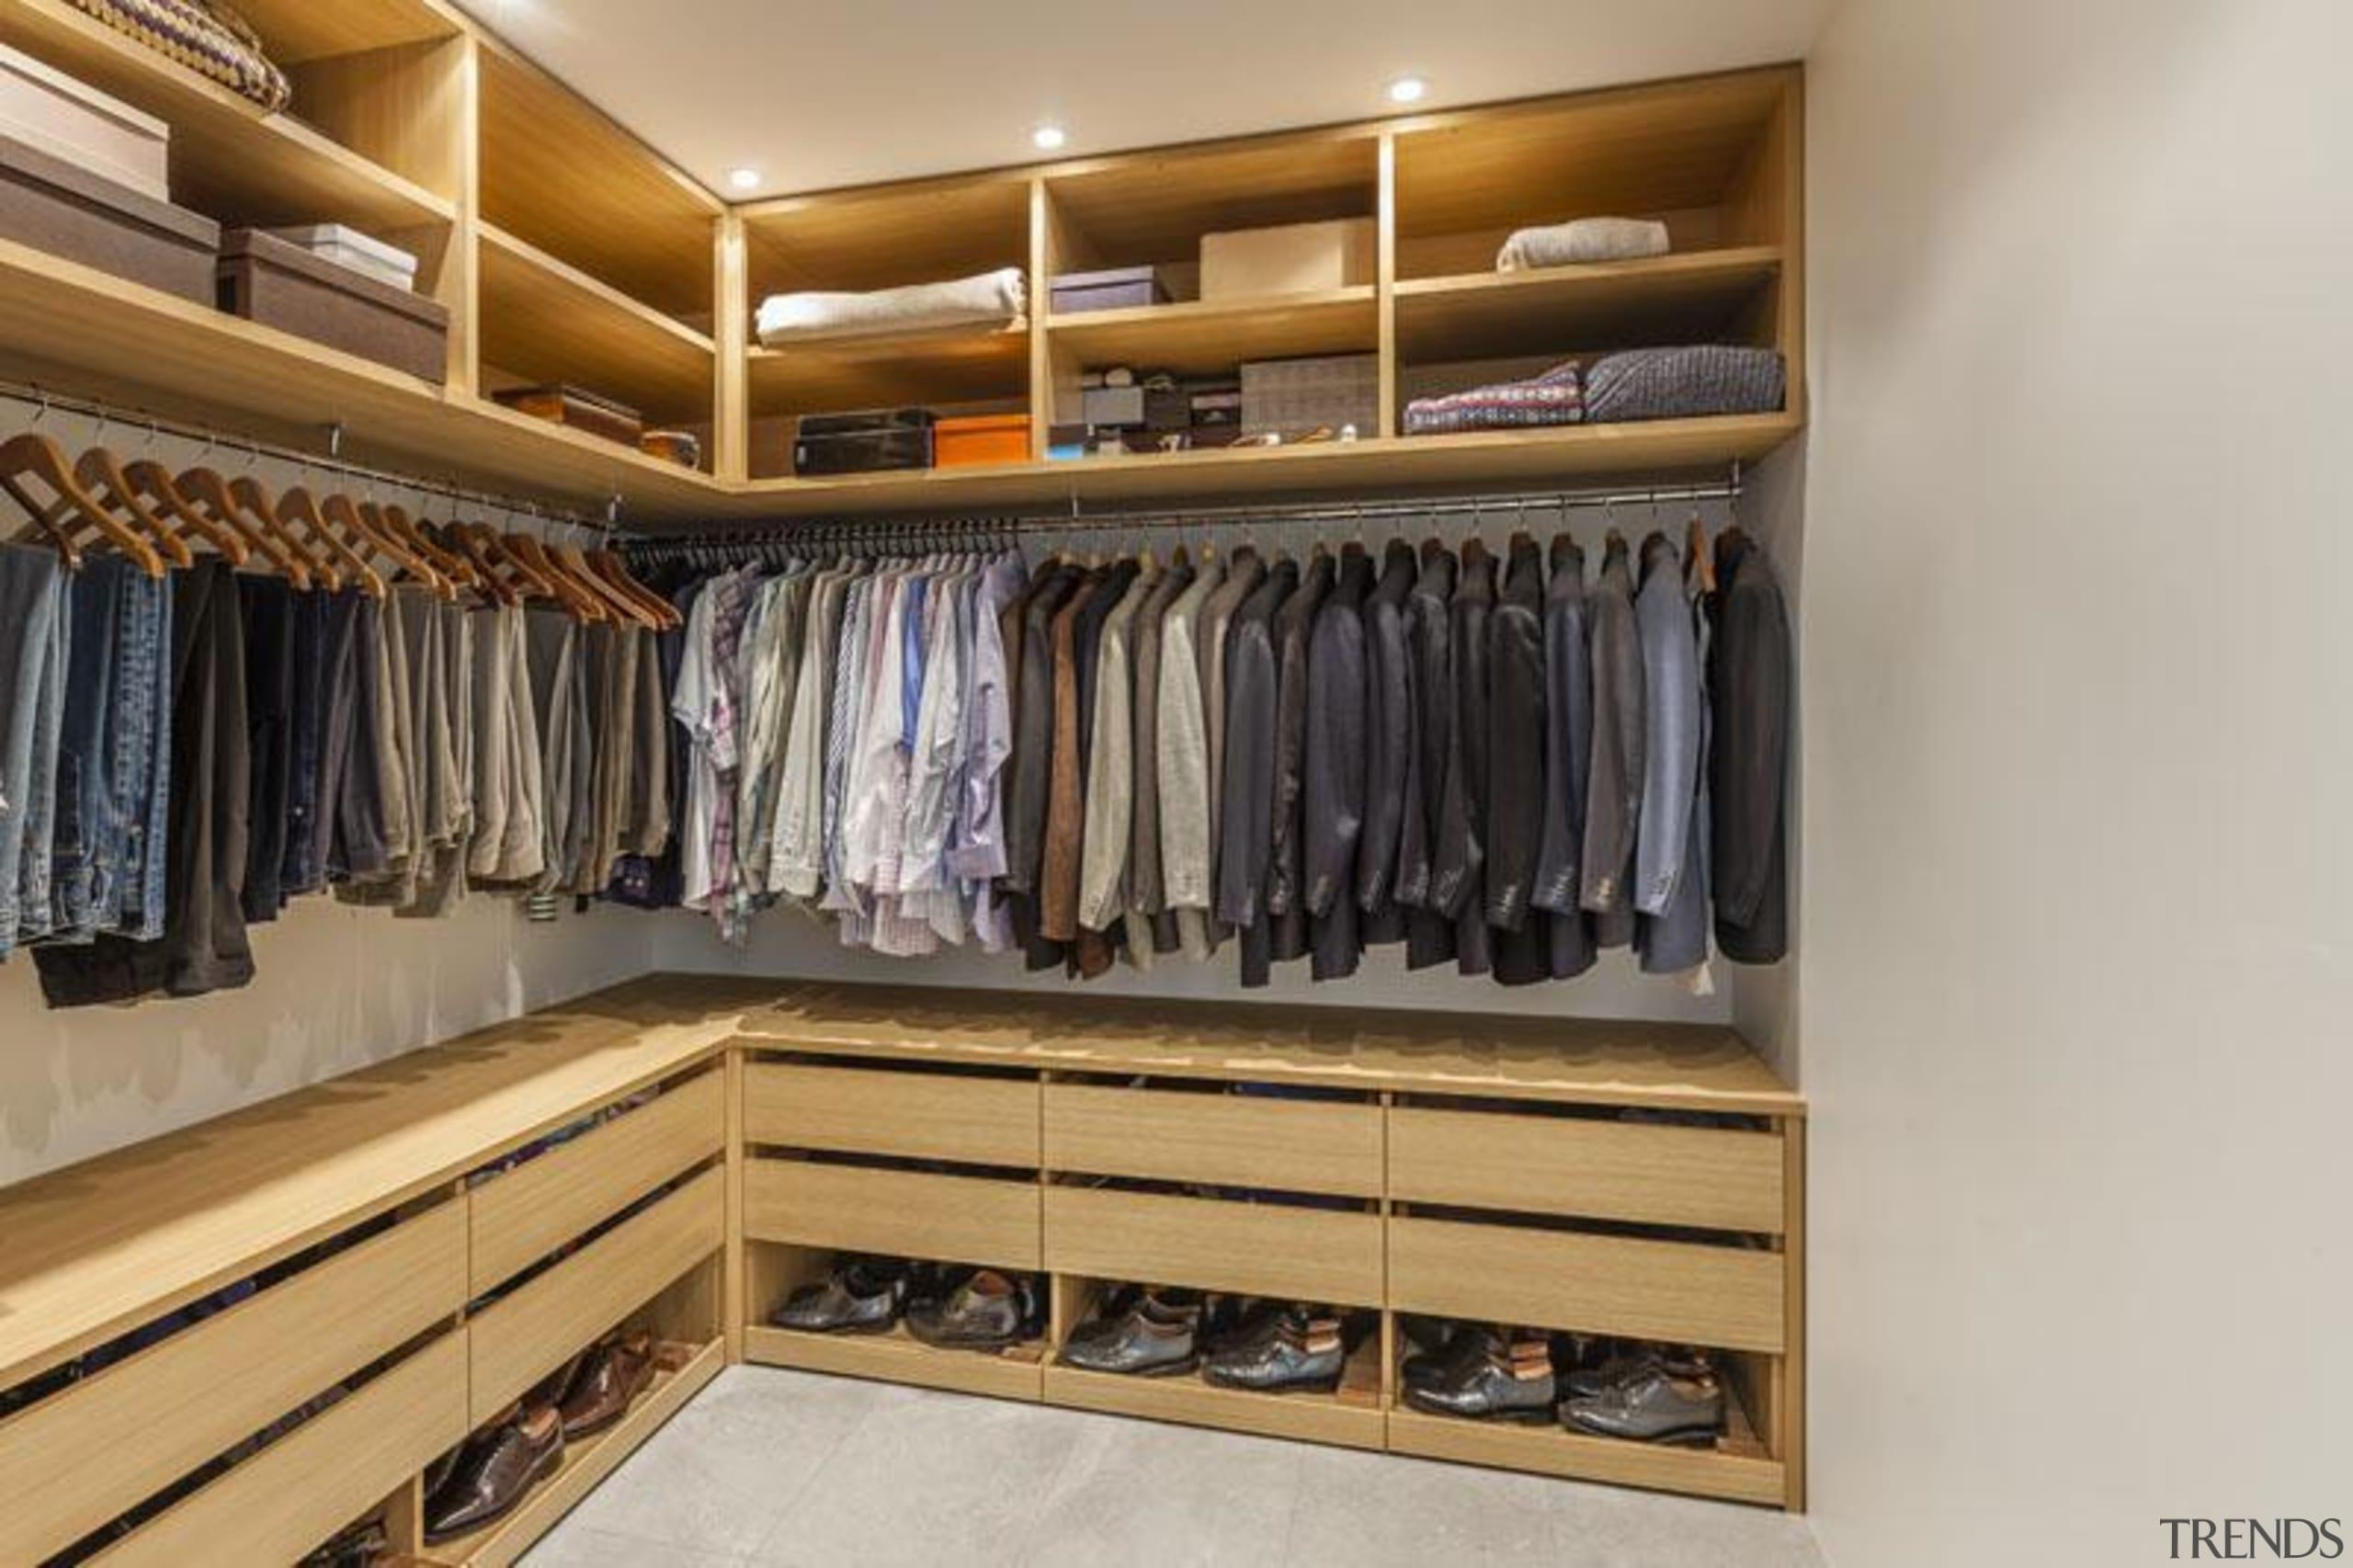 Wardrobe 4 - boutique | closet | furniture boutique, closet, furniture, room, wardrobe, gray, brown